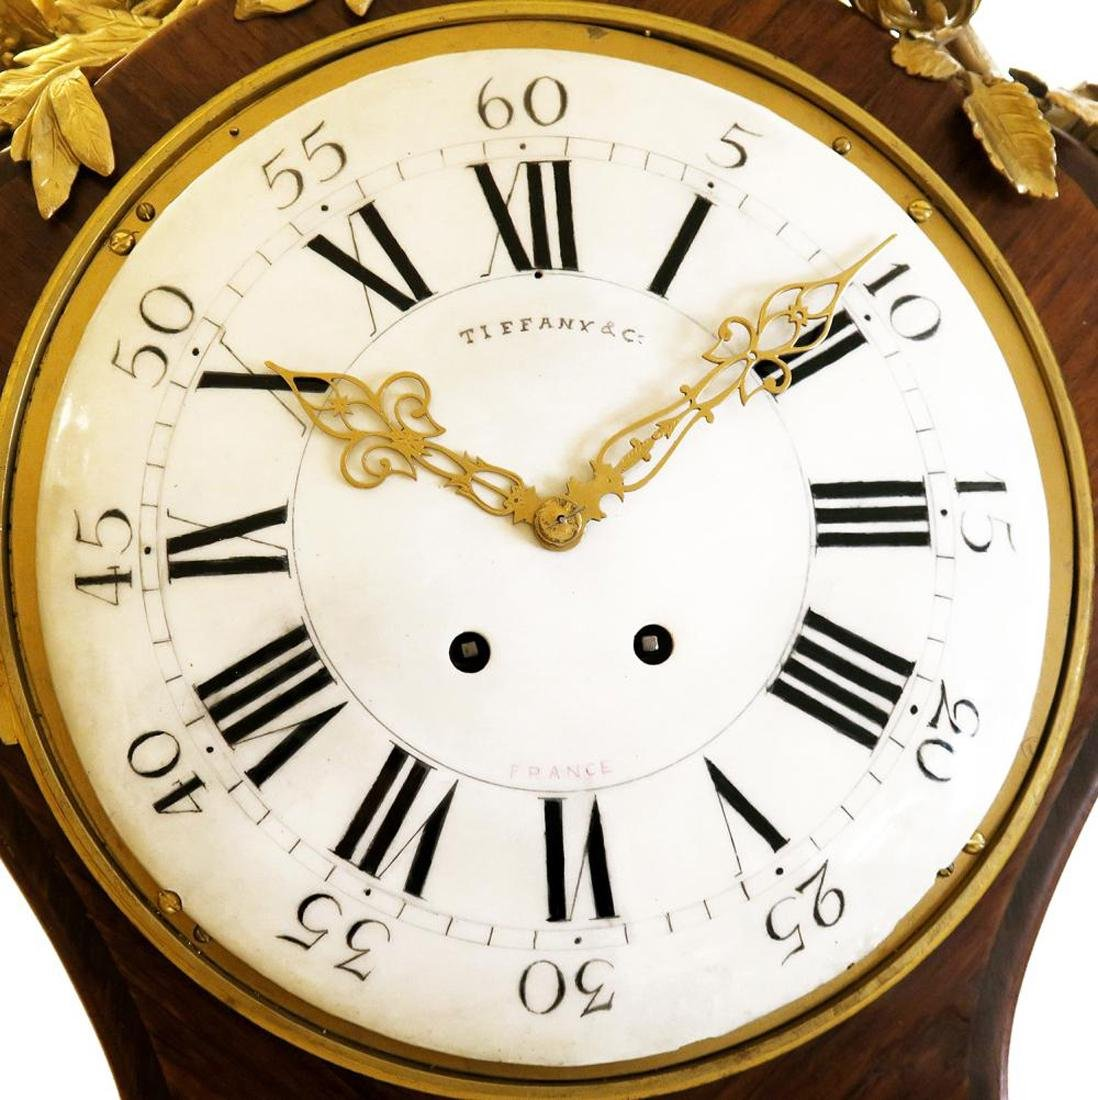 Tiffany & Co. Parquetry & Bronze Long-case Clock - 8